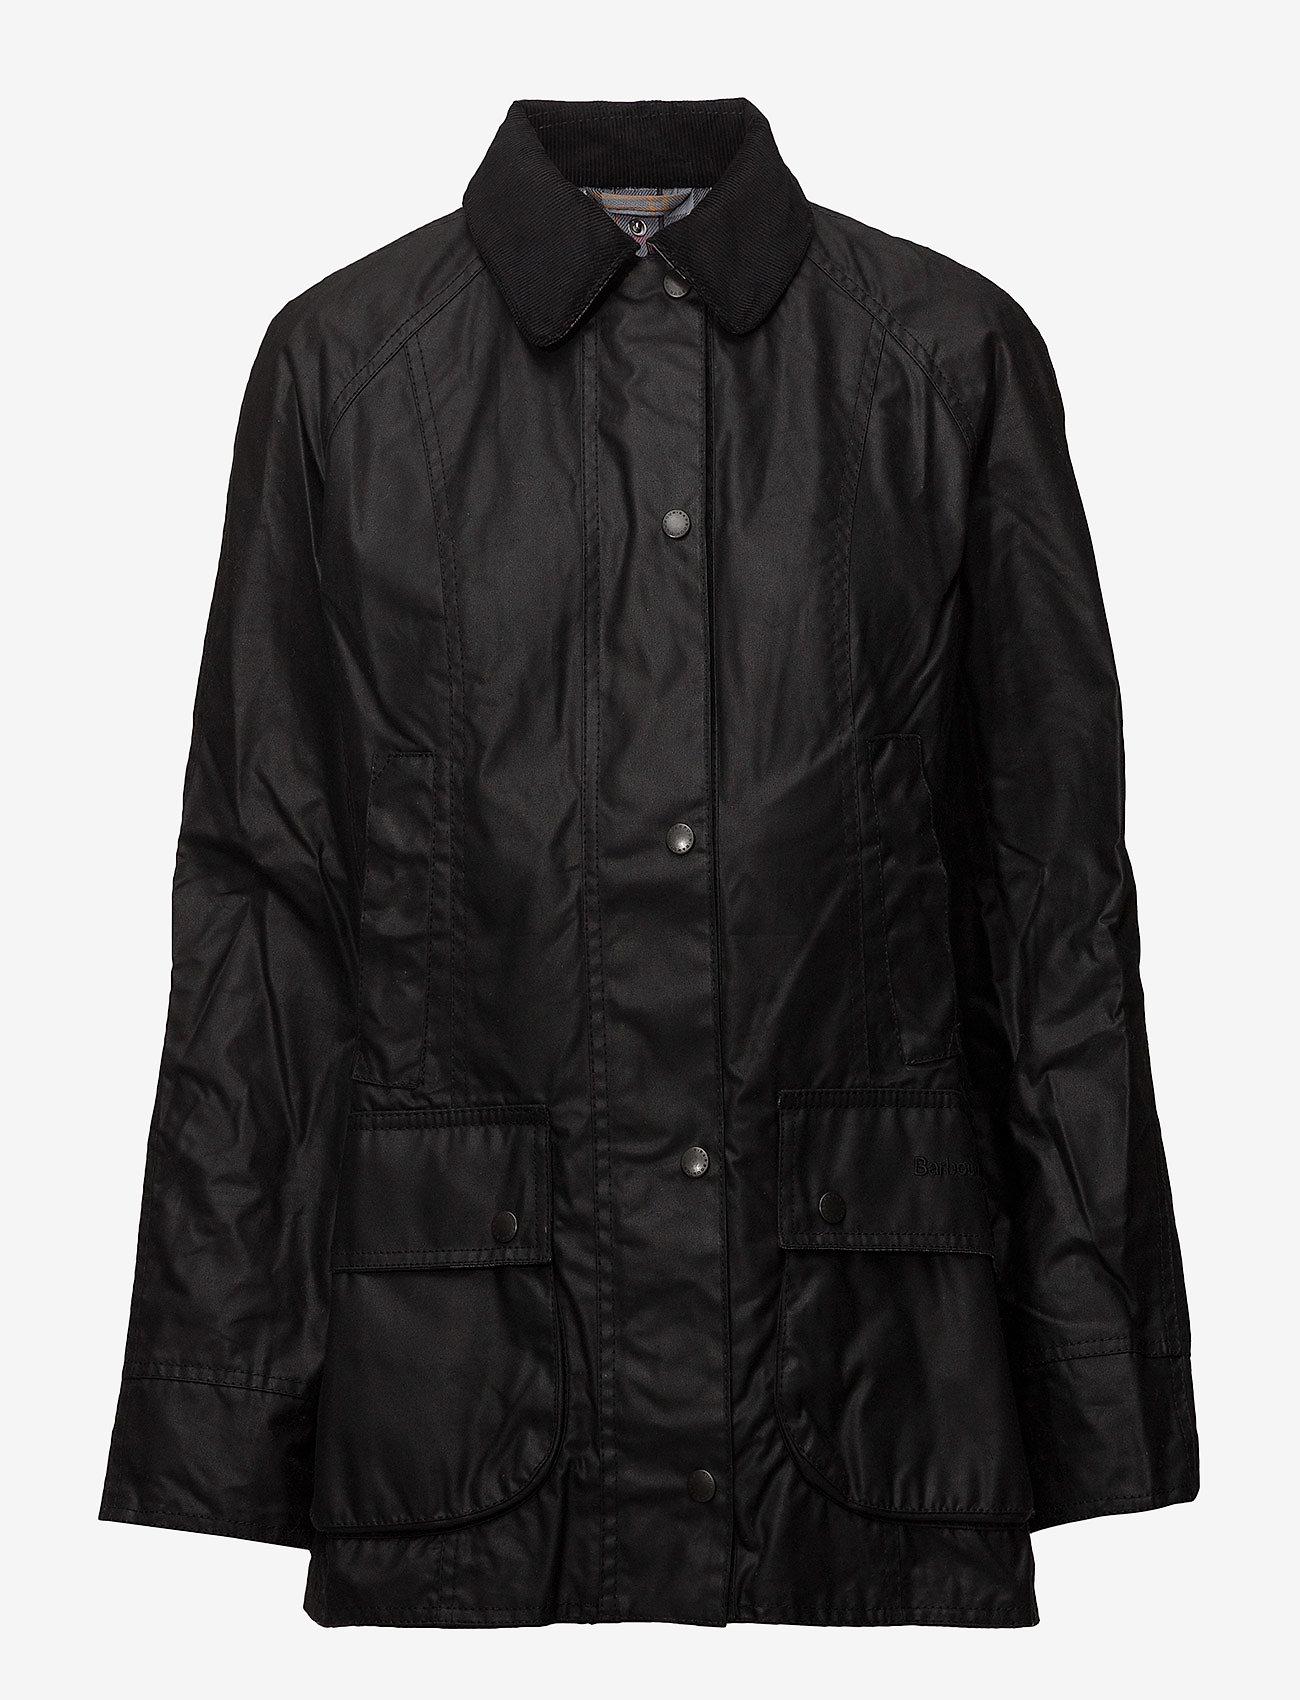 Barbour - Barbour Beadnell Wax Jacket - lette jakker - black - 1